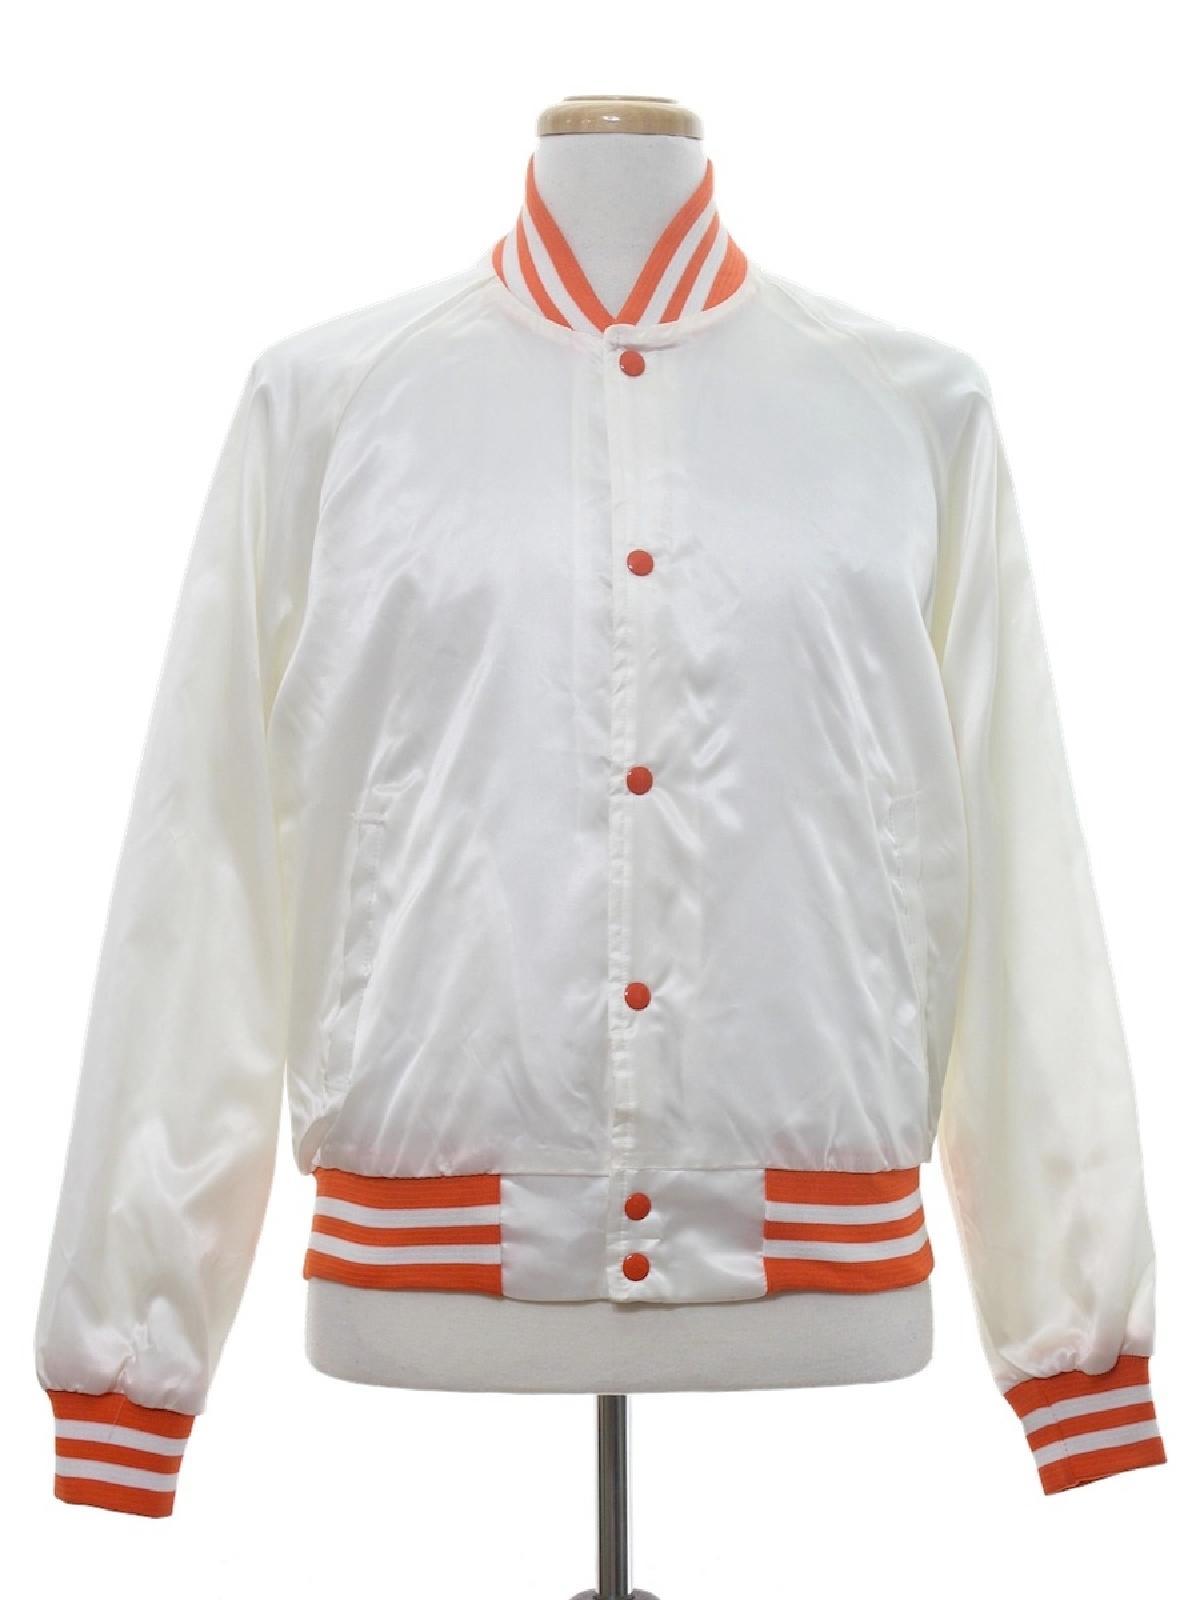 Blank Satin Jacket